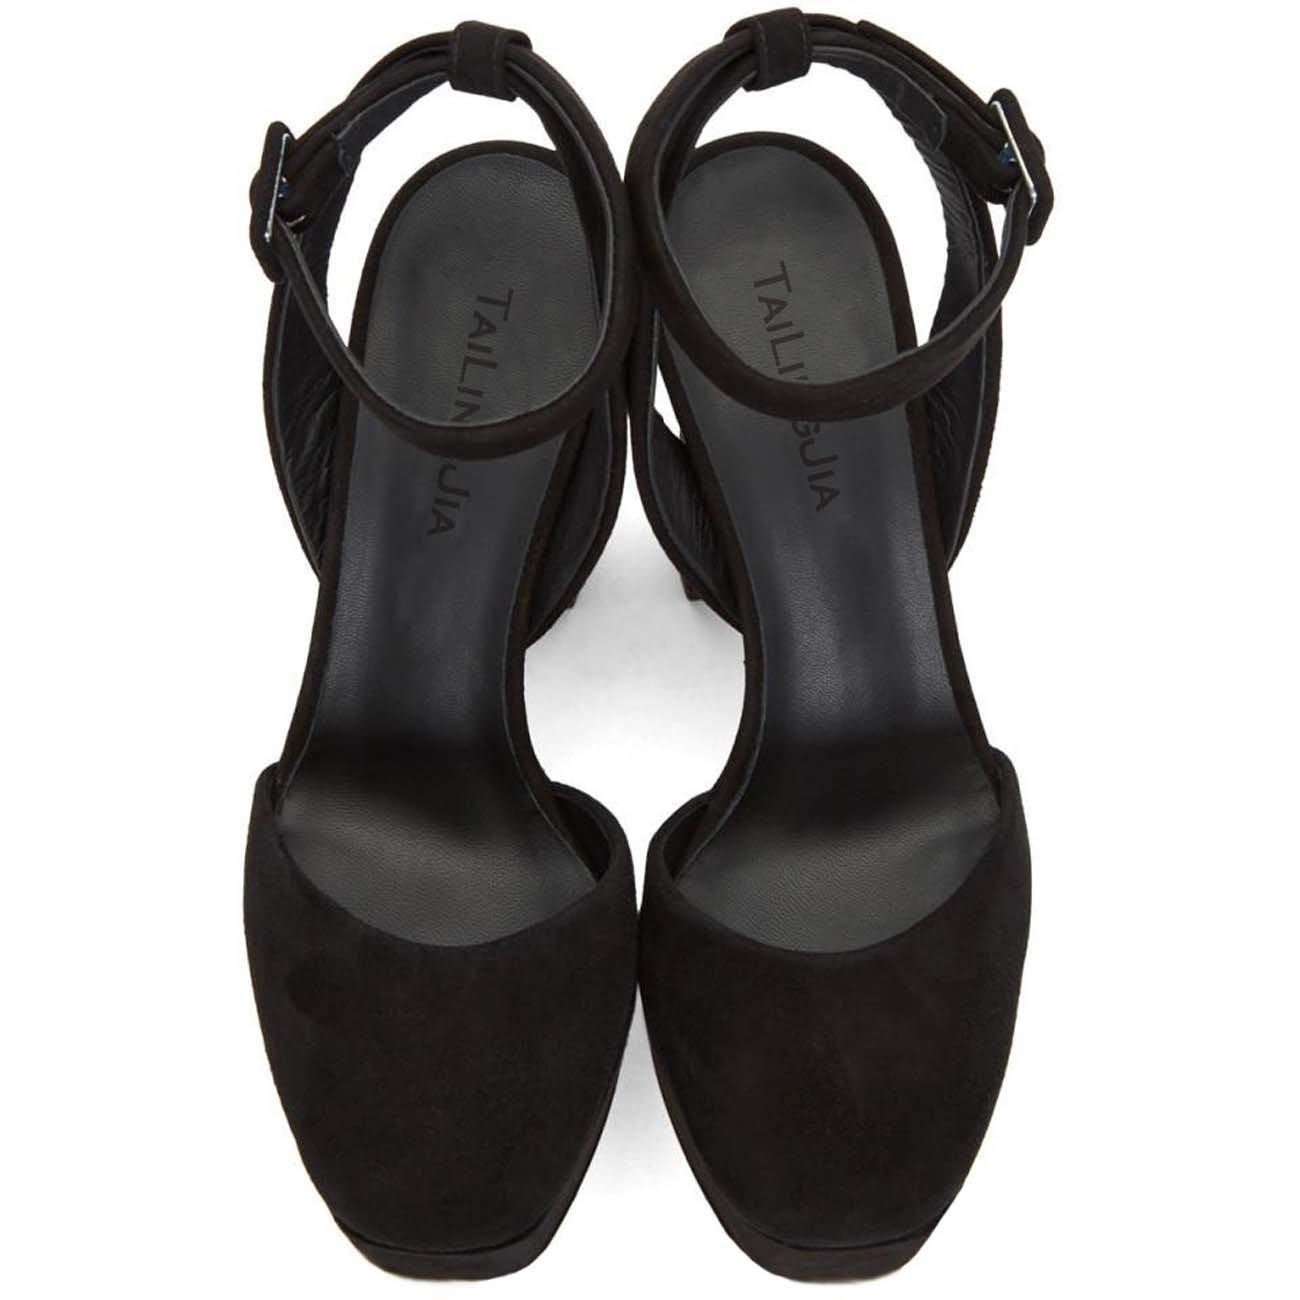 Zapatos De Cabeza Cabeza Cabeza Redonda De La Plataforma Impermeable De Tacón Alto De Gamuza Negra De Las Señoras Zapatos De Mujer De Gran Tamaño,Negro,46 ea013d